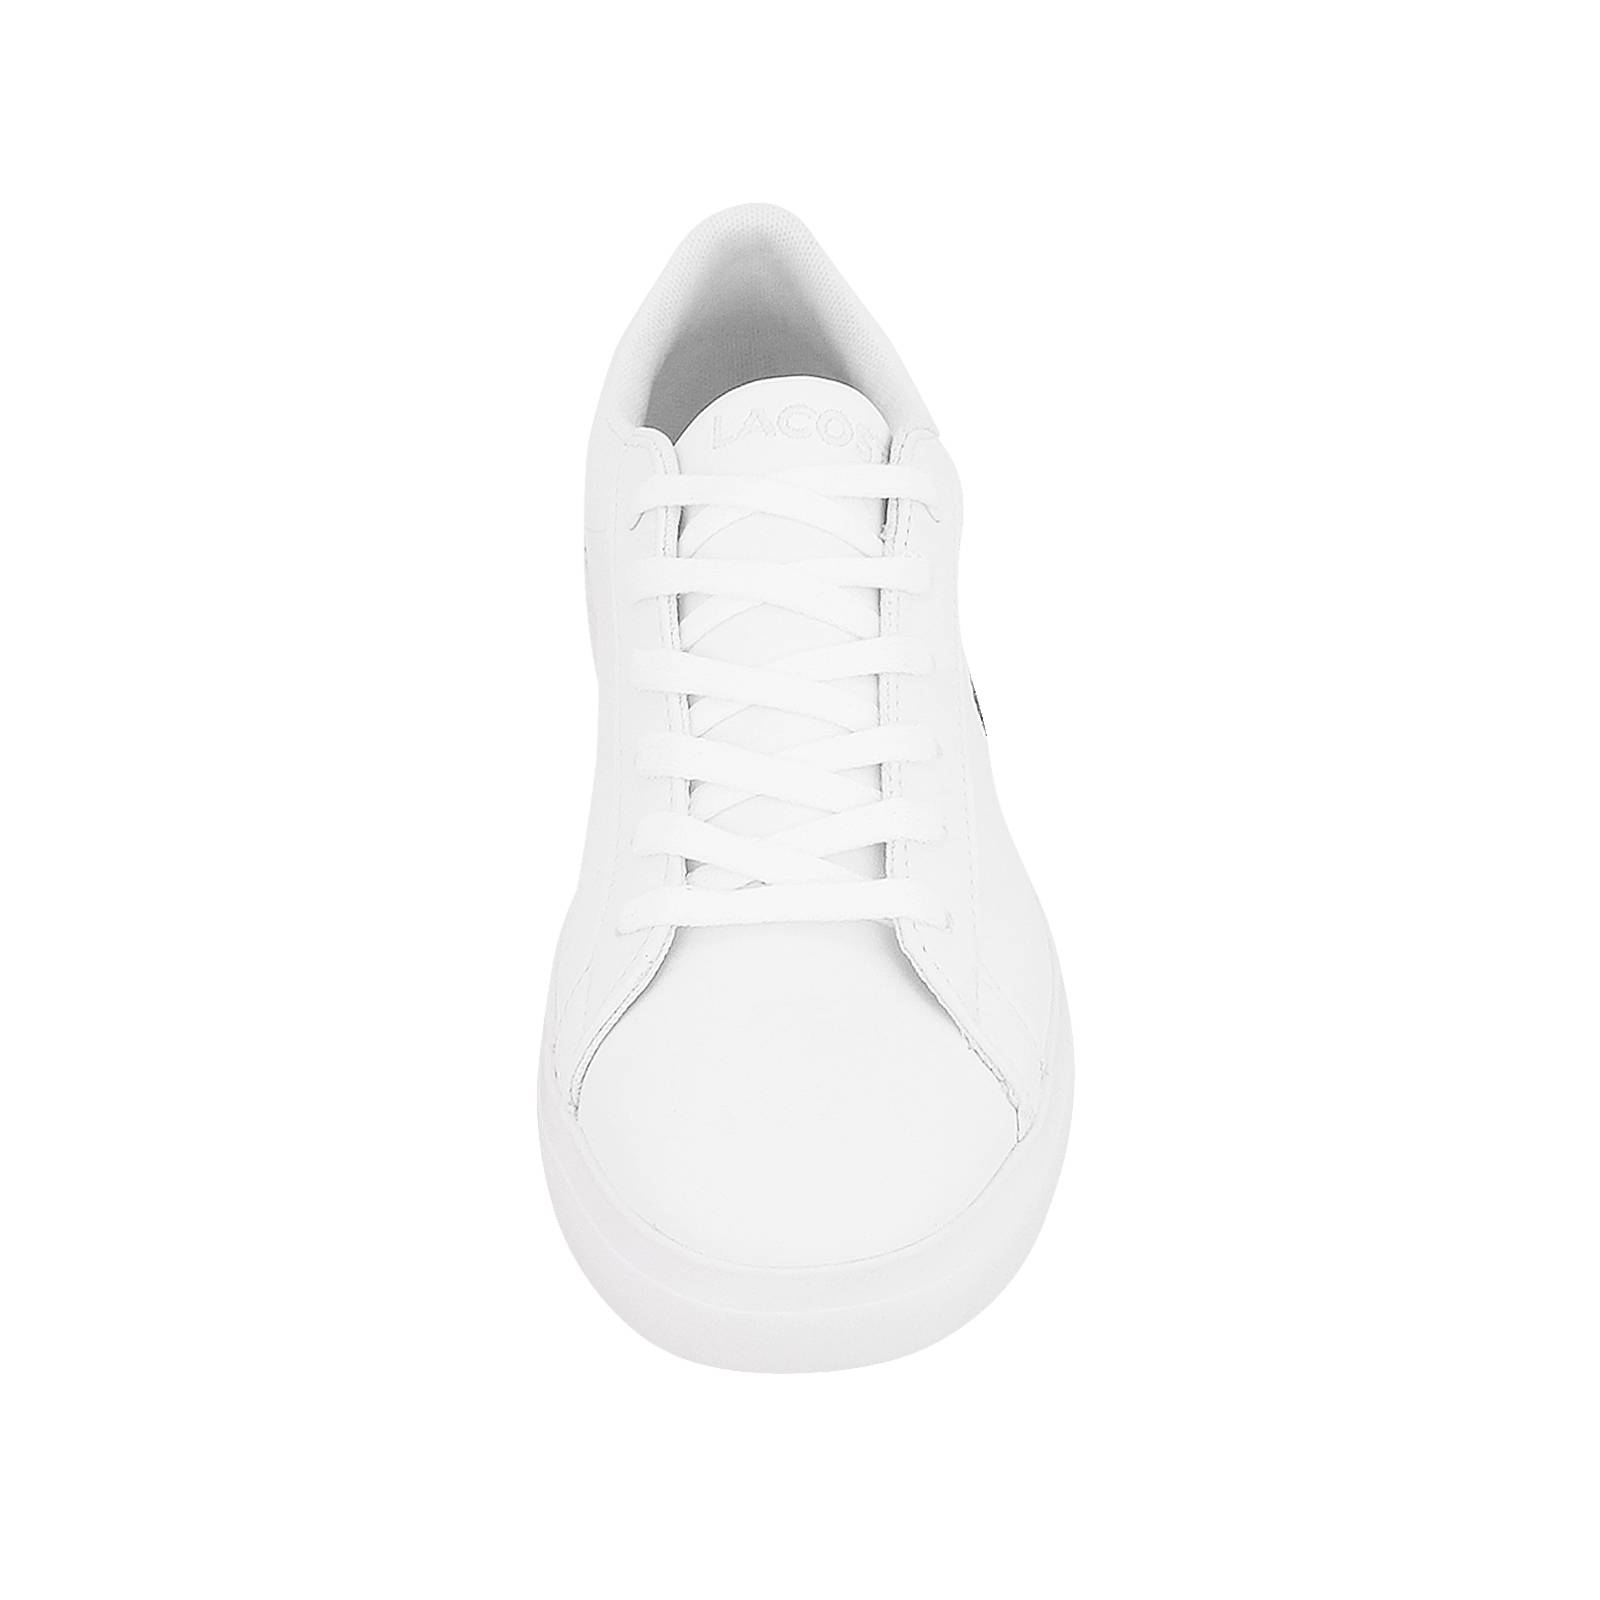 Lerond 119 5 CUJ - Παιδικά παπούτσια casual Lacoste από δερμα ... 2aa5ce80c98